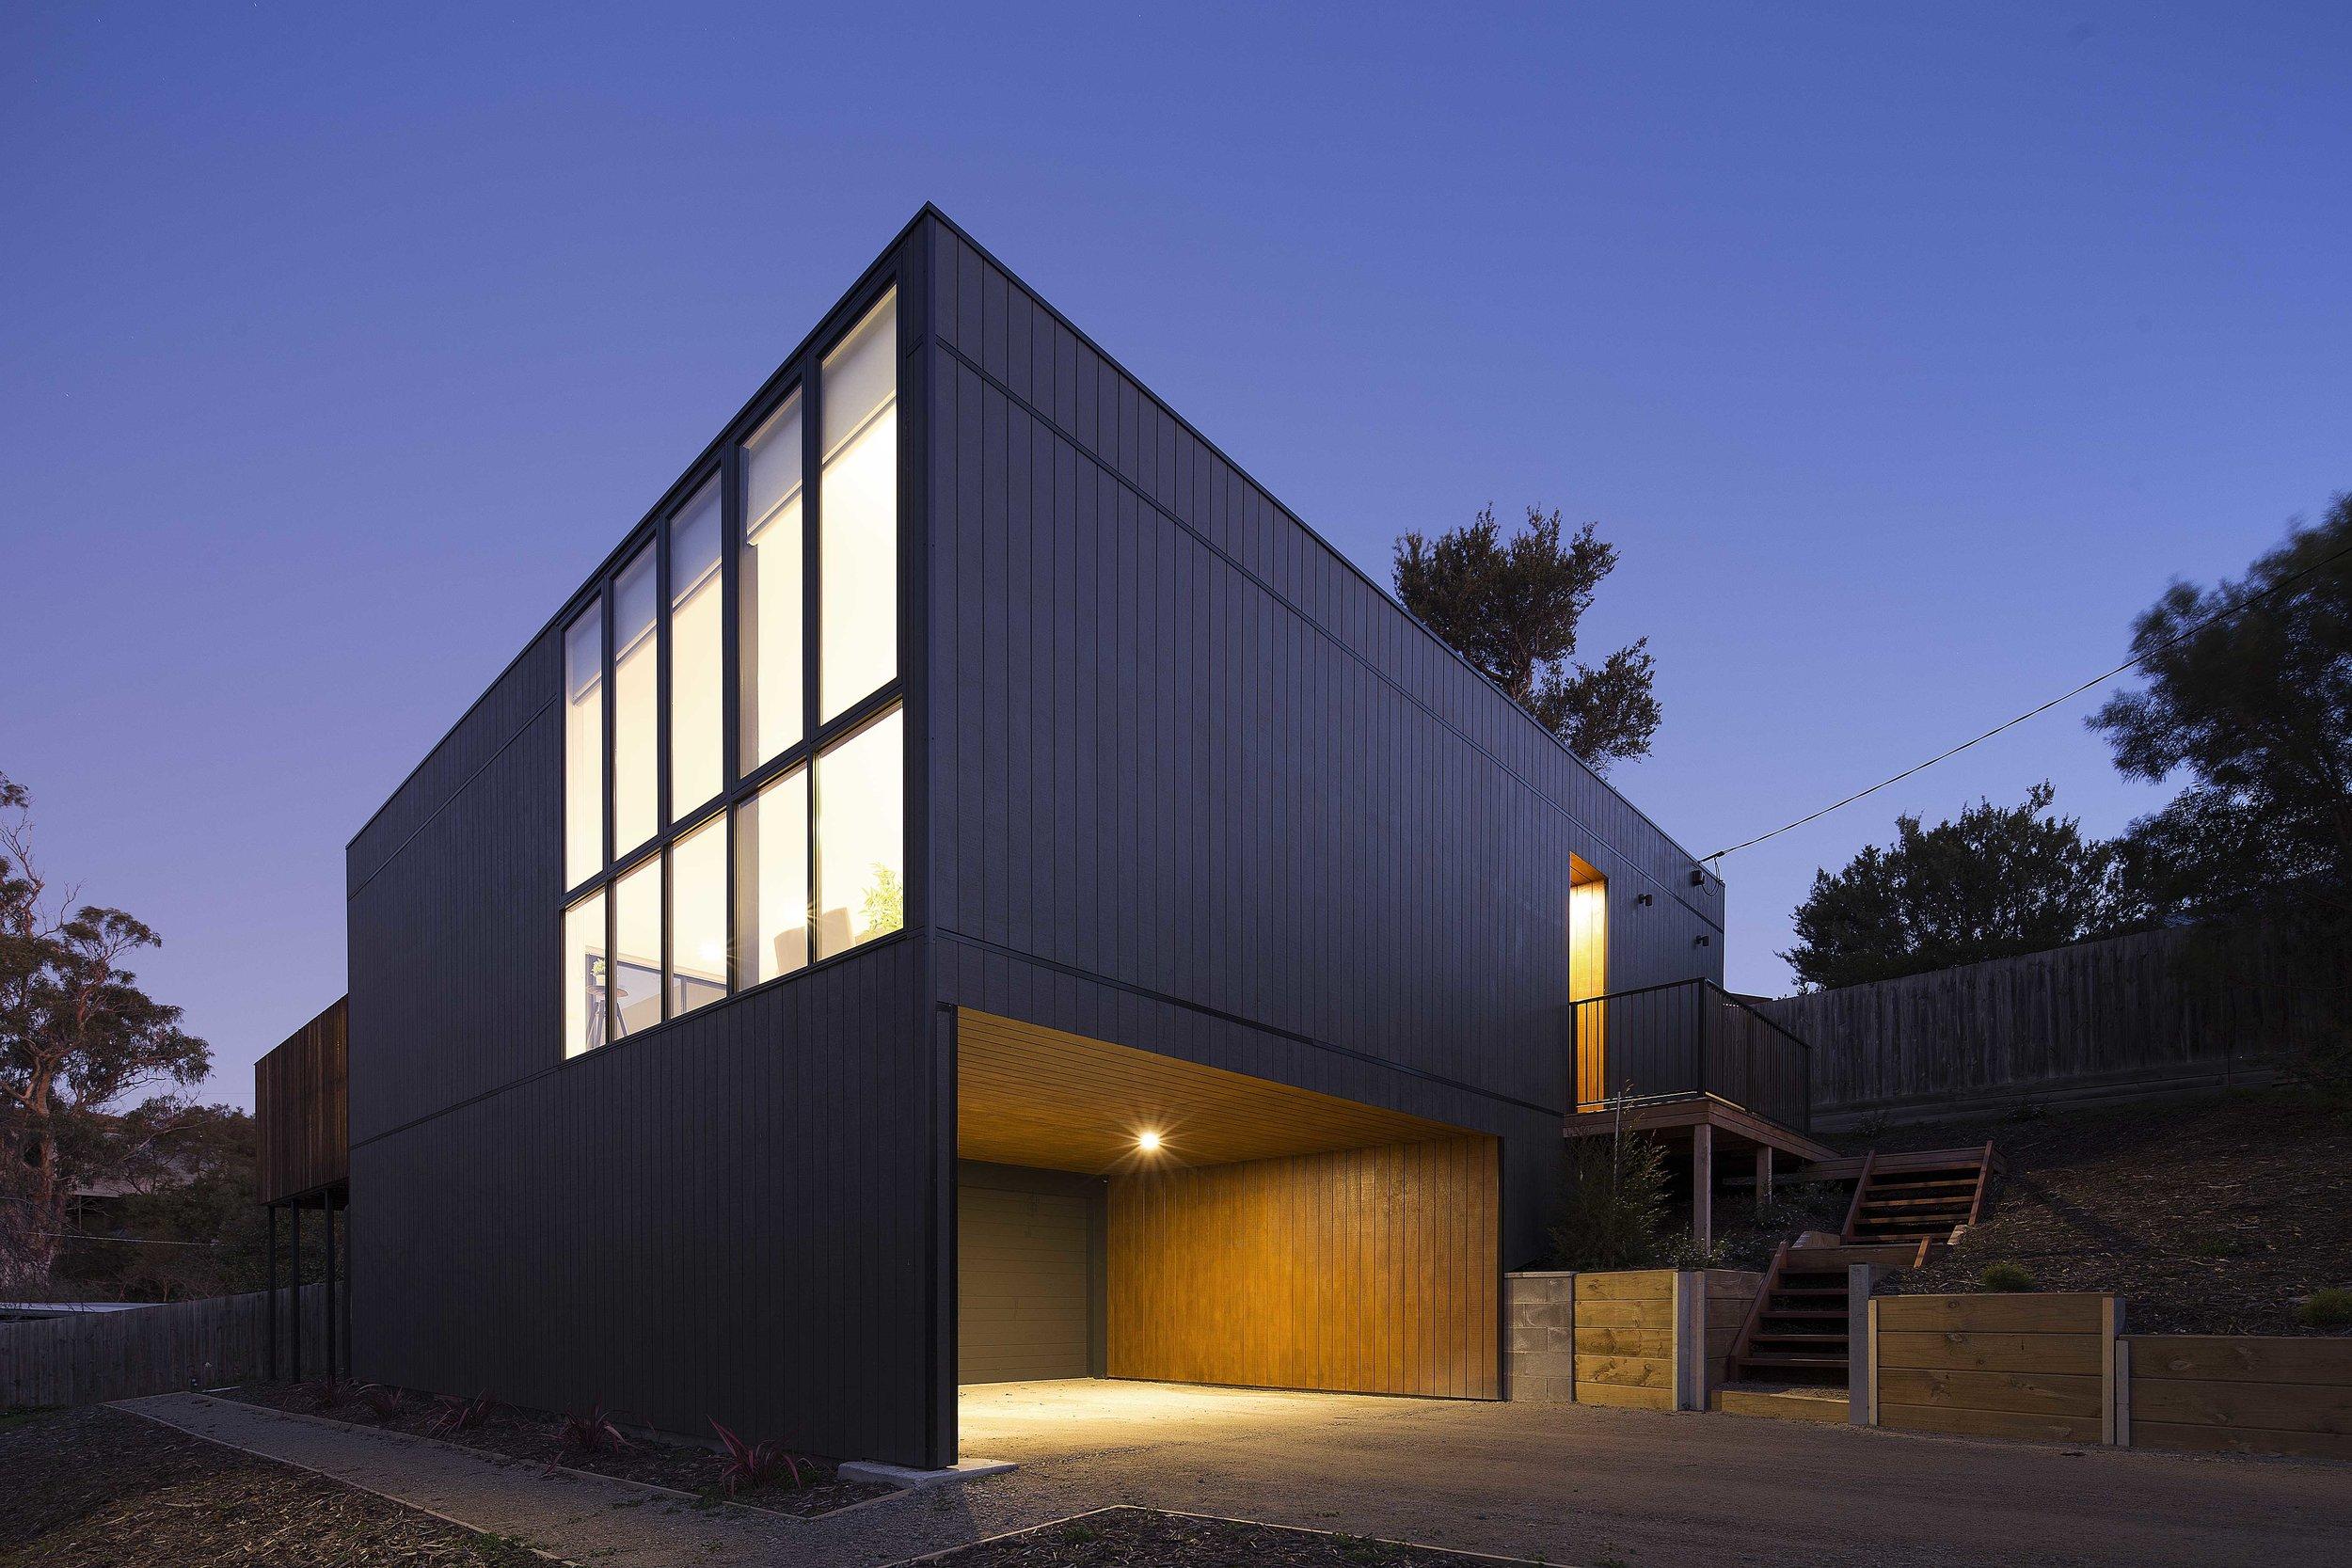 Pitch_Architecture_Black Box House_1